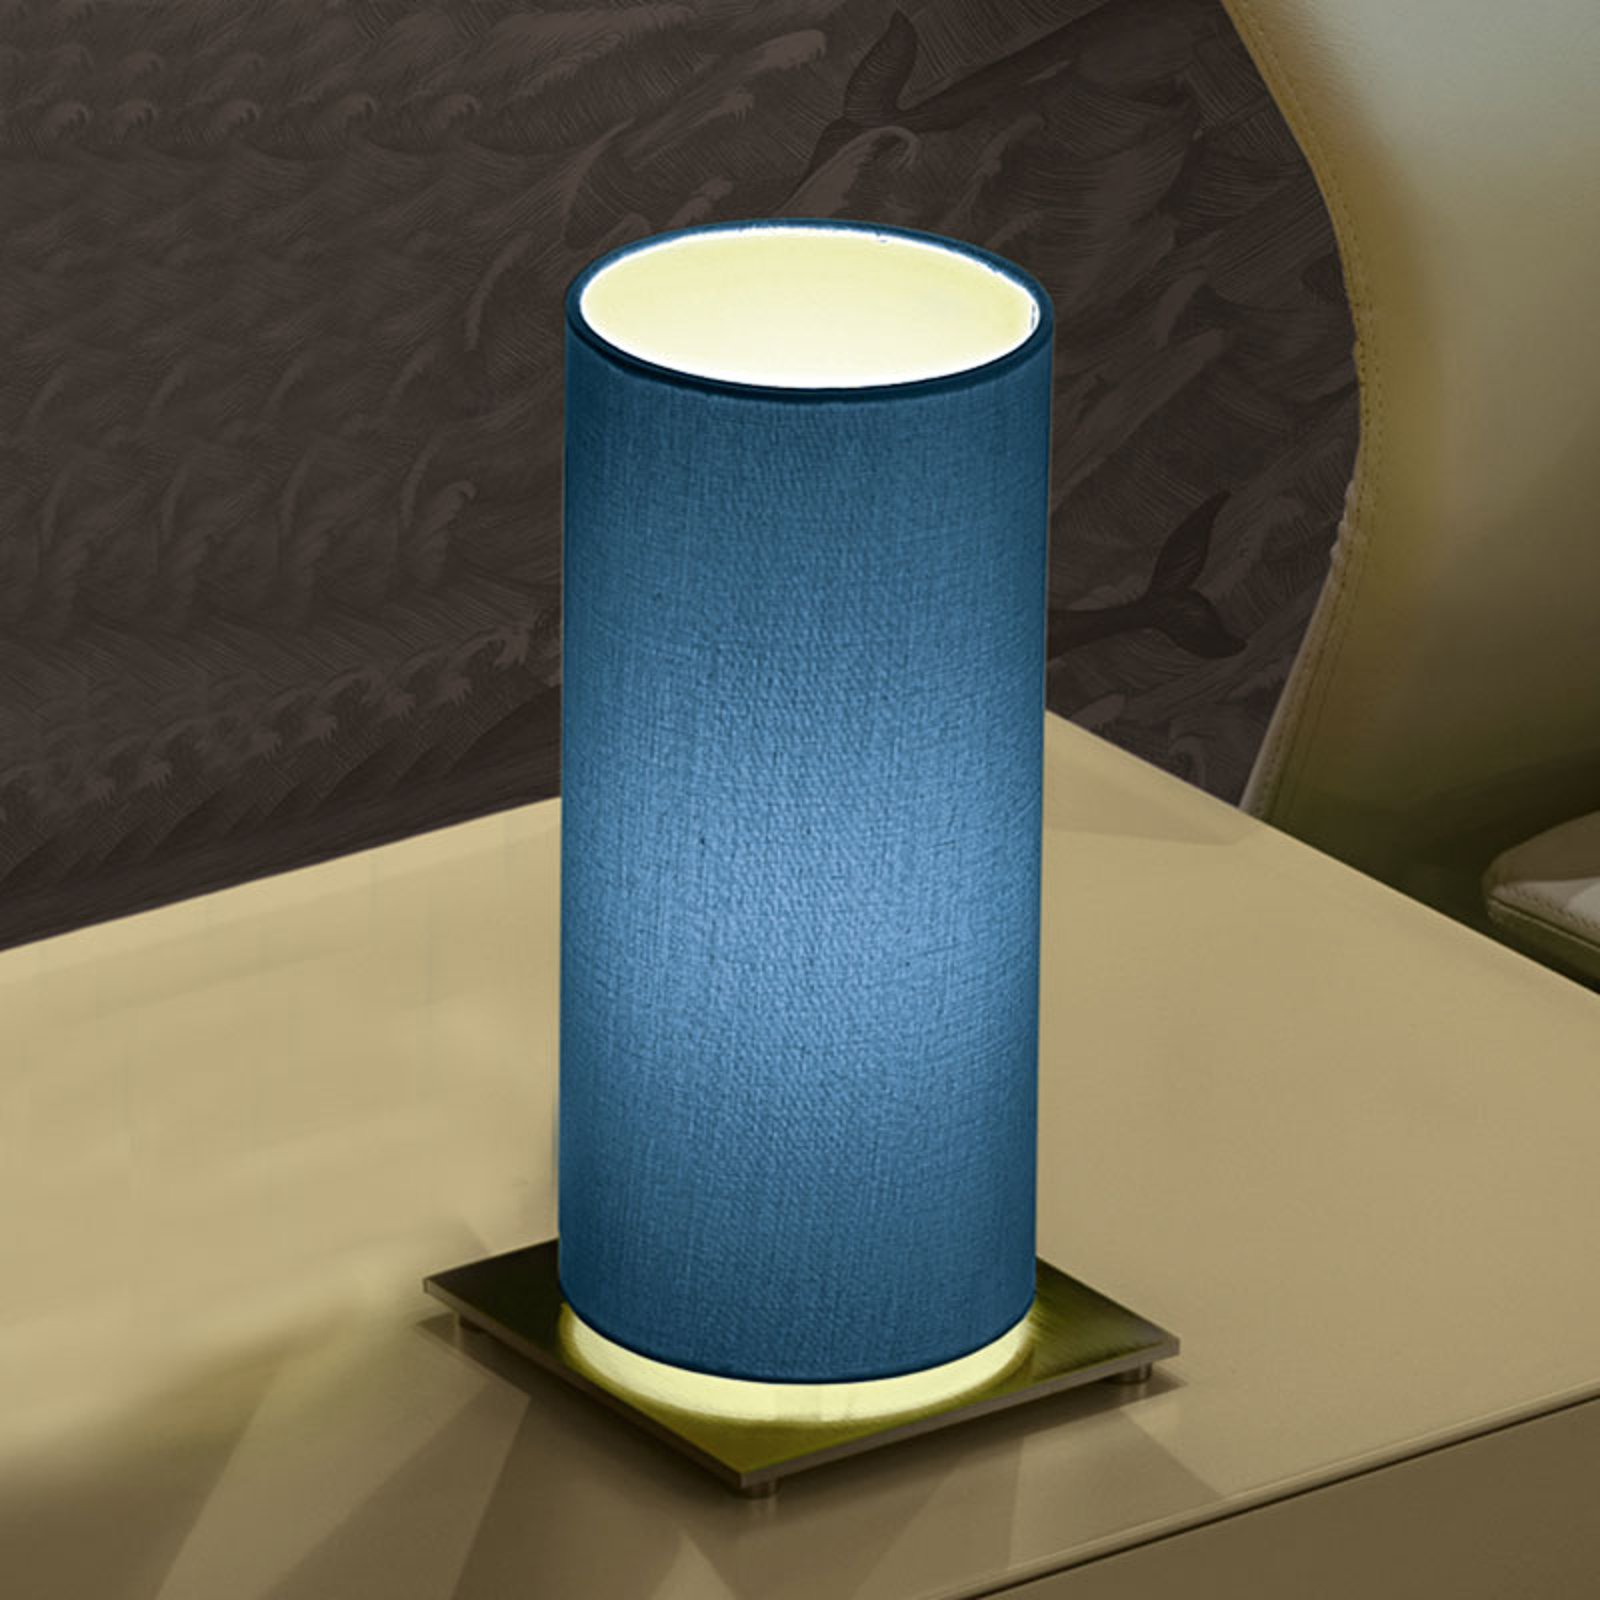 Modo Luce Lost bordlampe Ø 18 cm blå